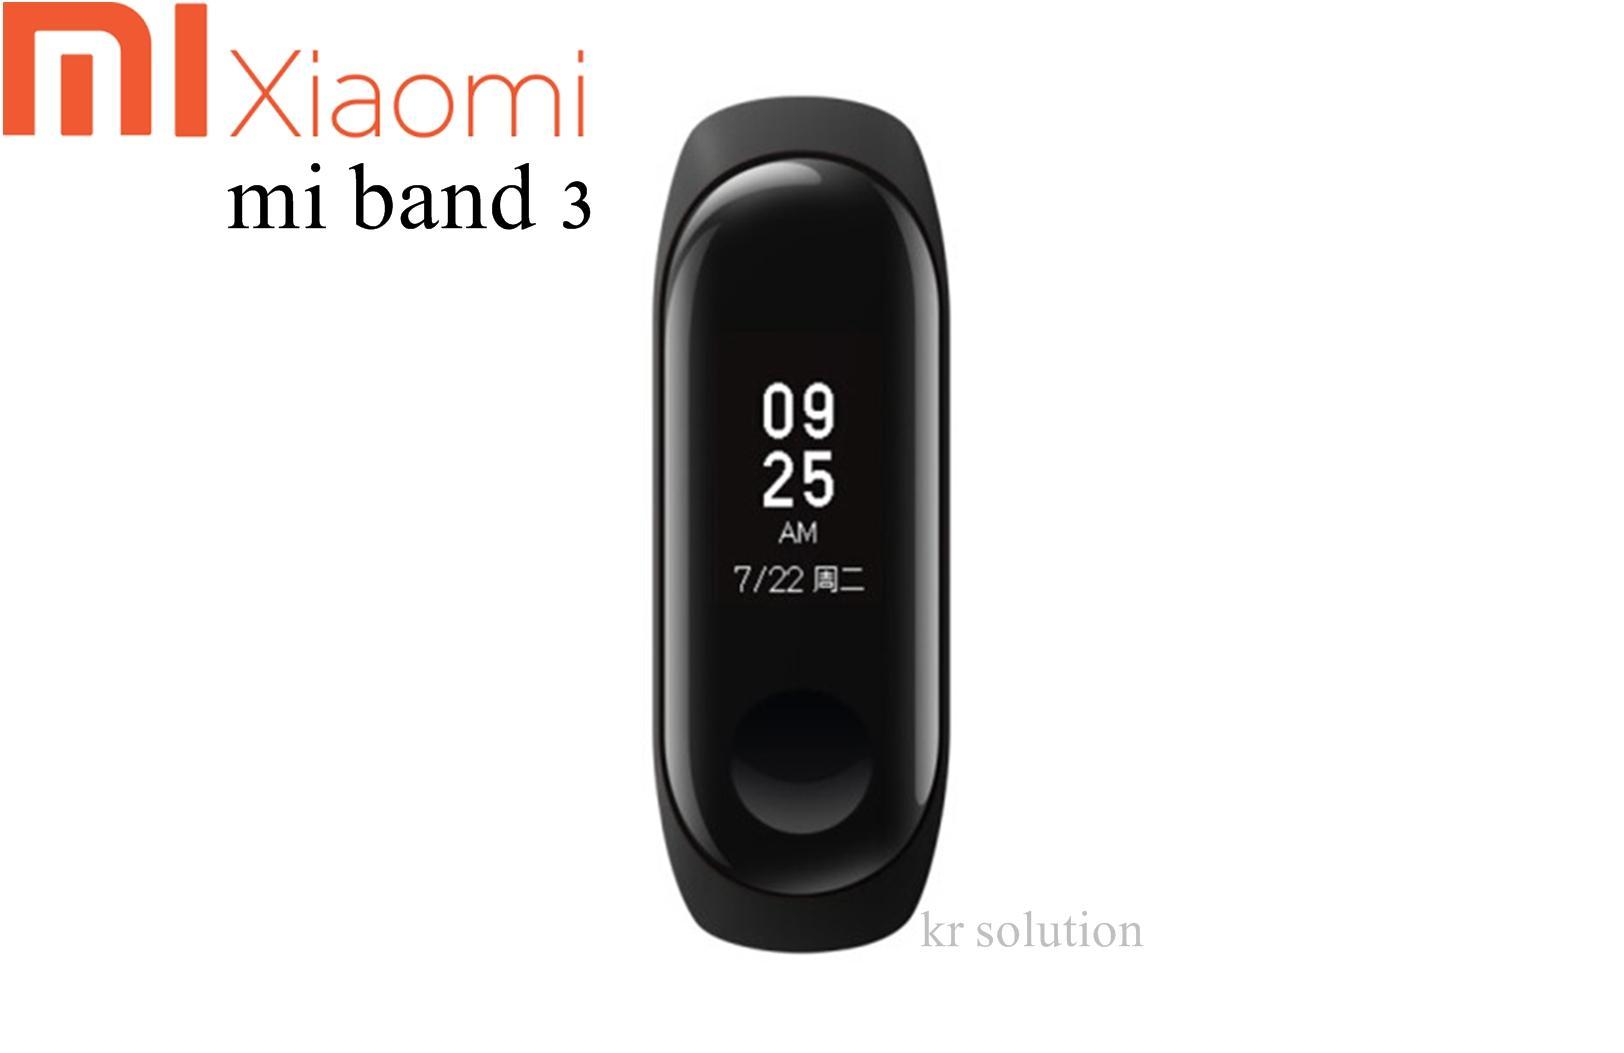 Xiaomi Mi band 3 OLED Heart Rate Monitor Bluetooth 4.2 Smart Bracelet Wristband Original (Chinese Version)